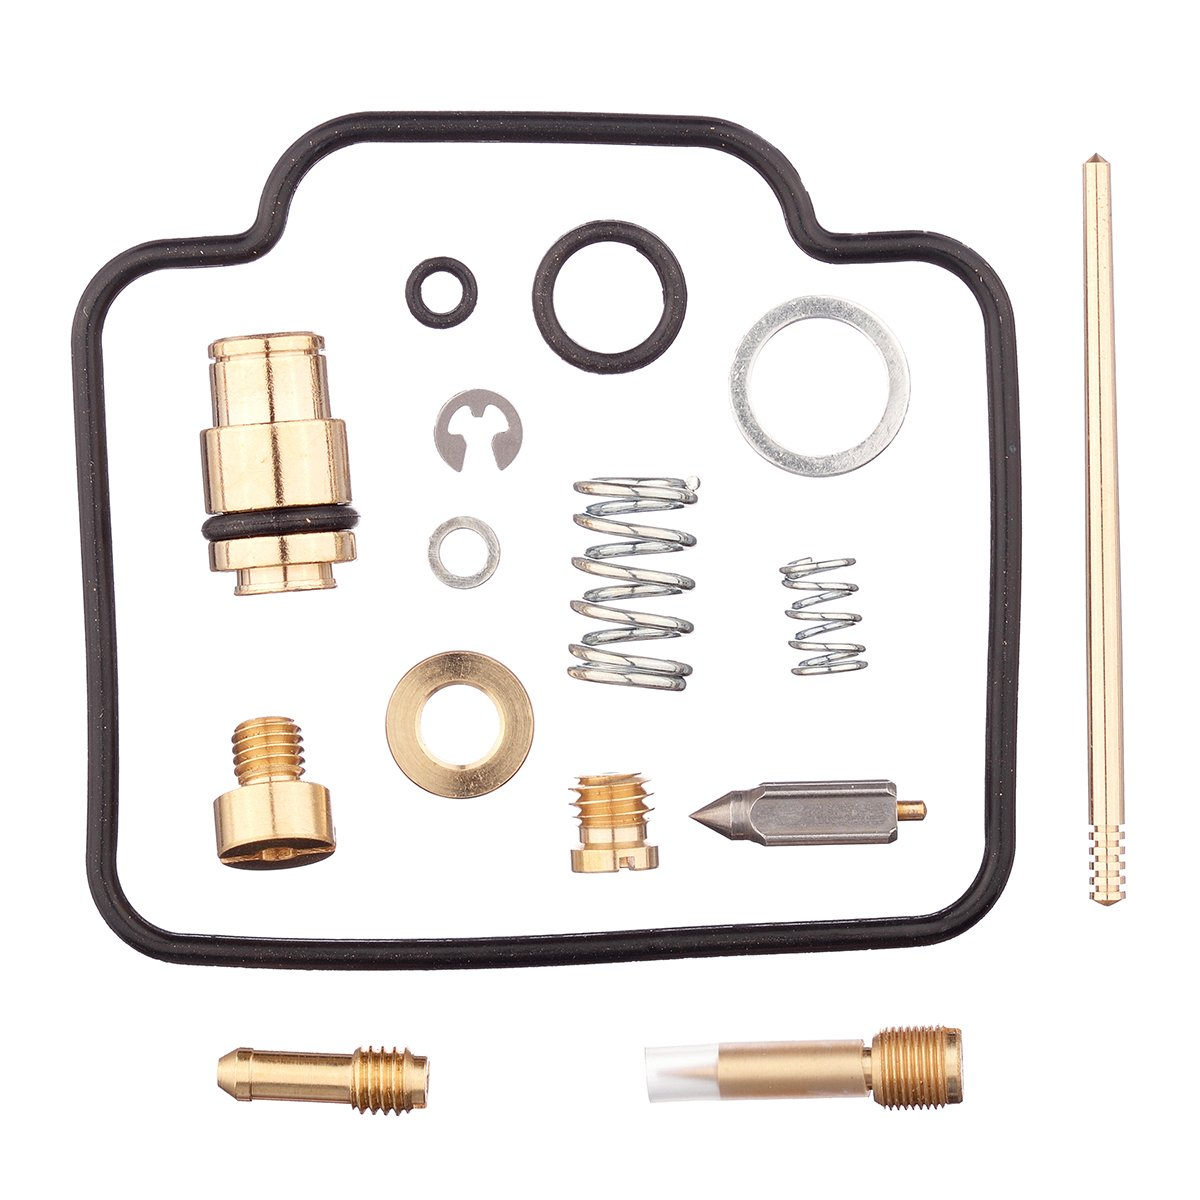 HIFROM Carburetor Carb Rebuild Kit Repair For Suzuki LTF4WDX LT4WDX King Quad 1991 1992 1993 1994 1995 1996 1997 1998